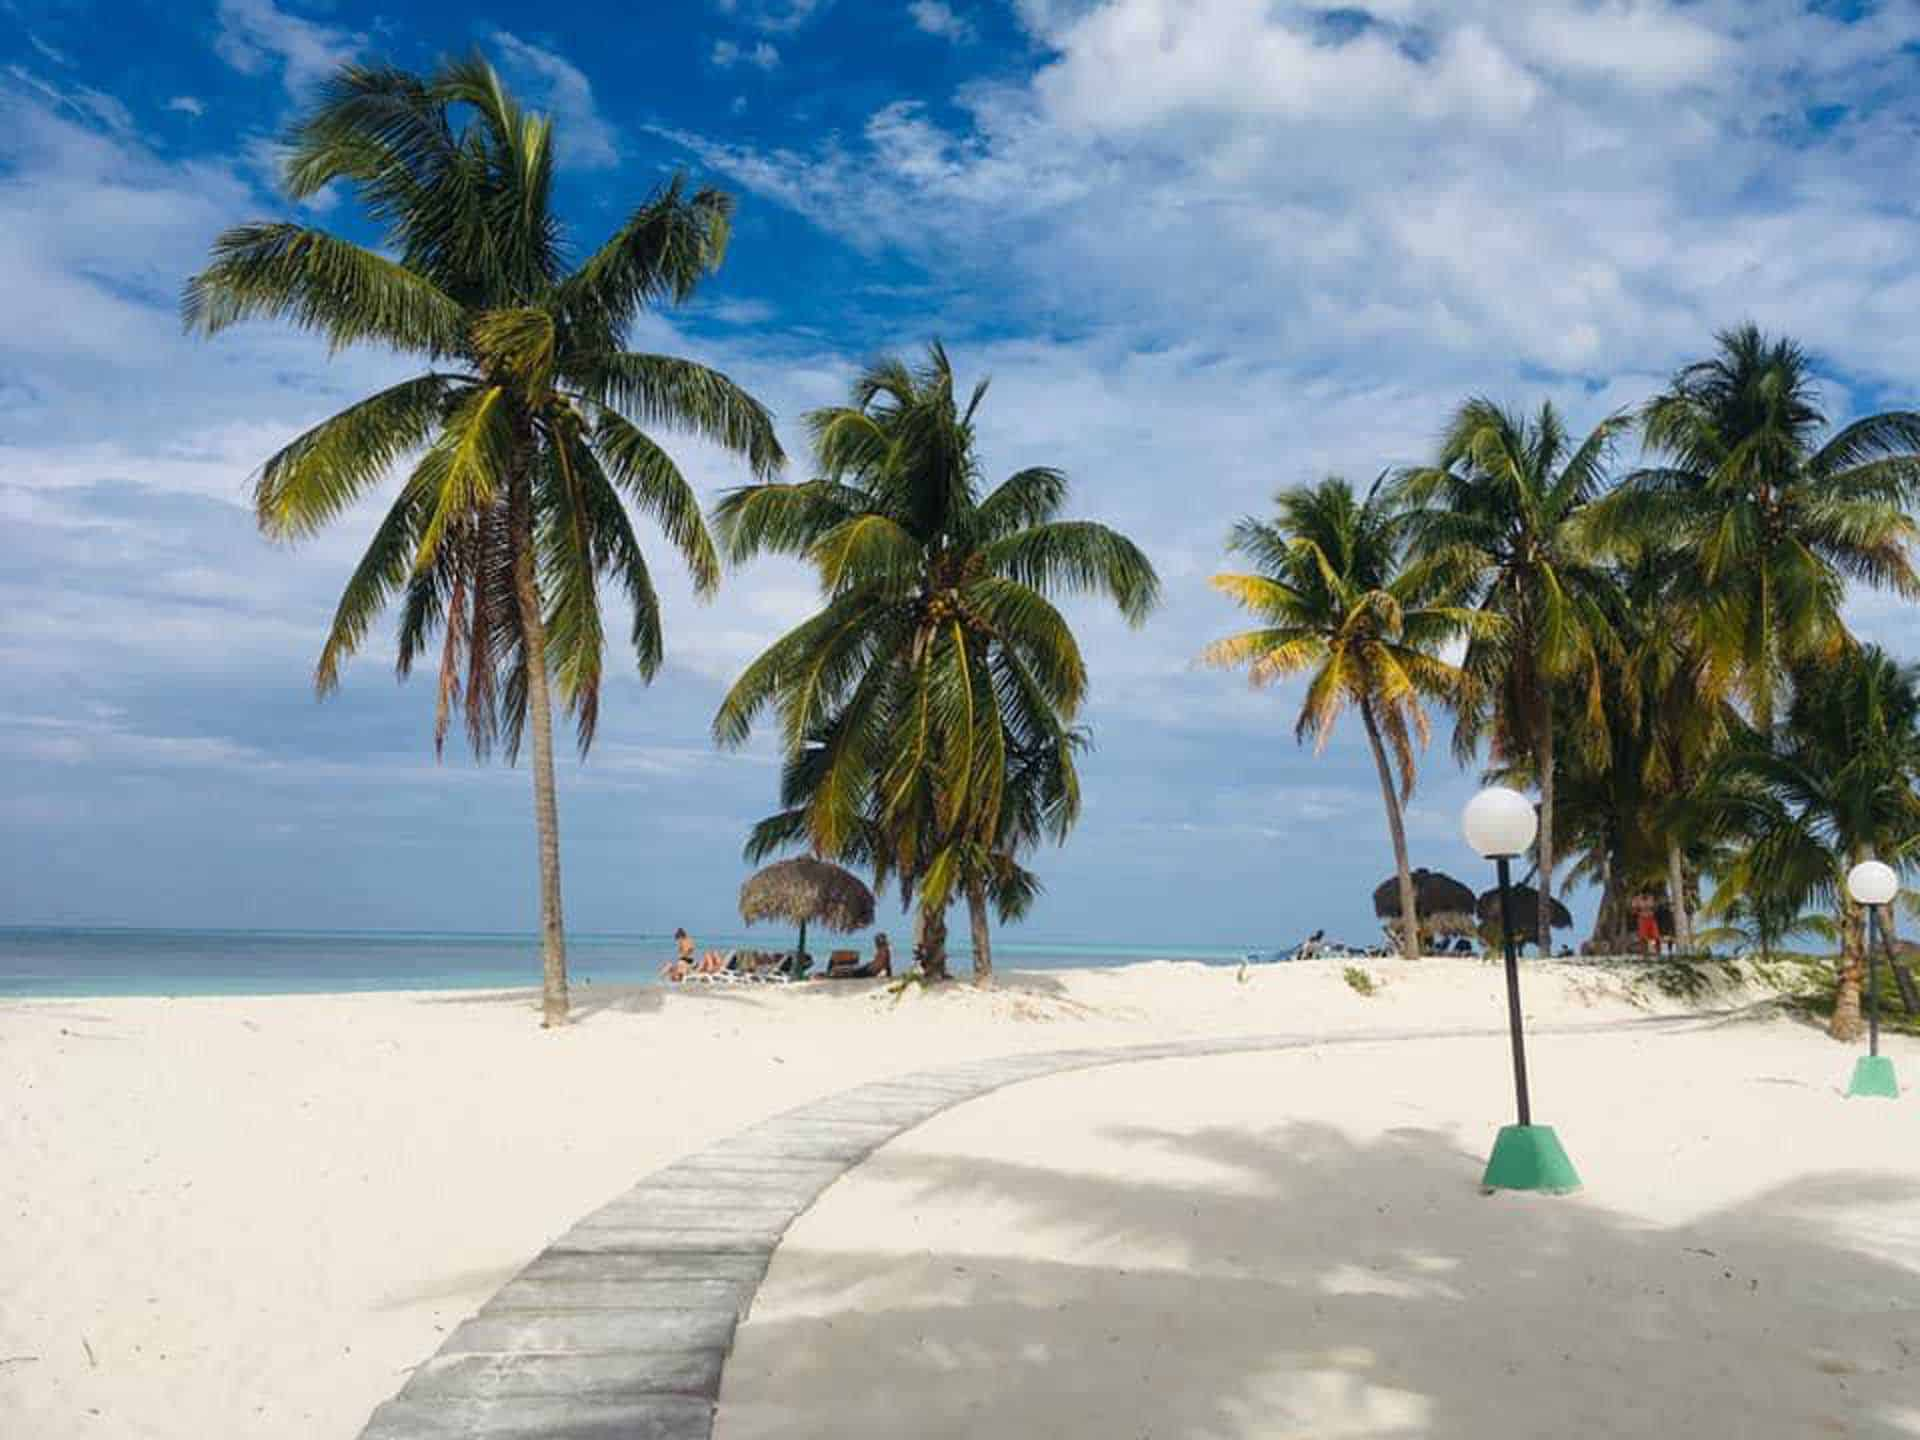 H0311 Cabana Tropical 04 cuba autrement